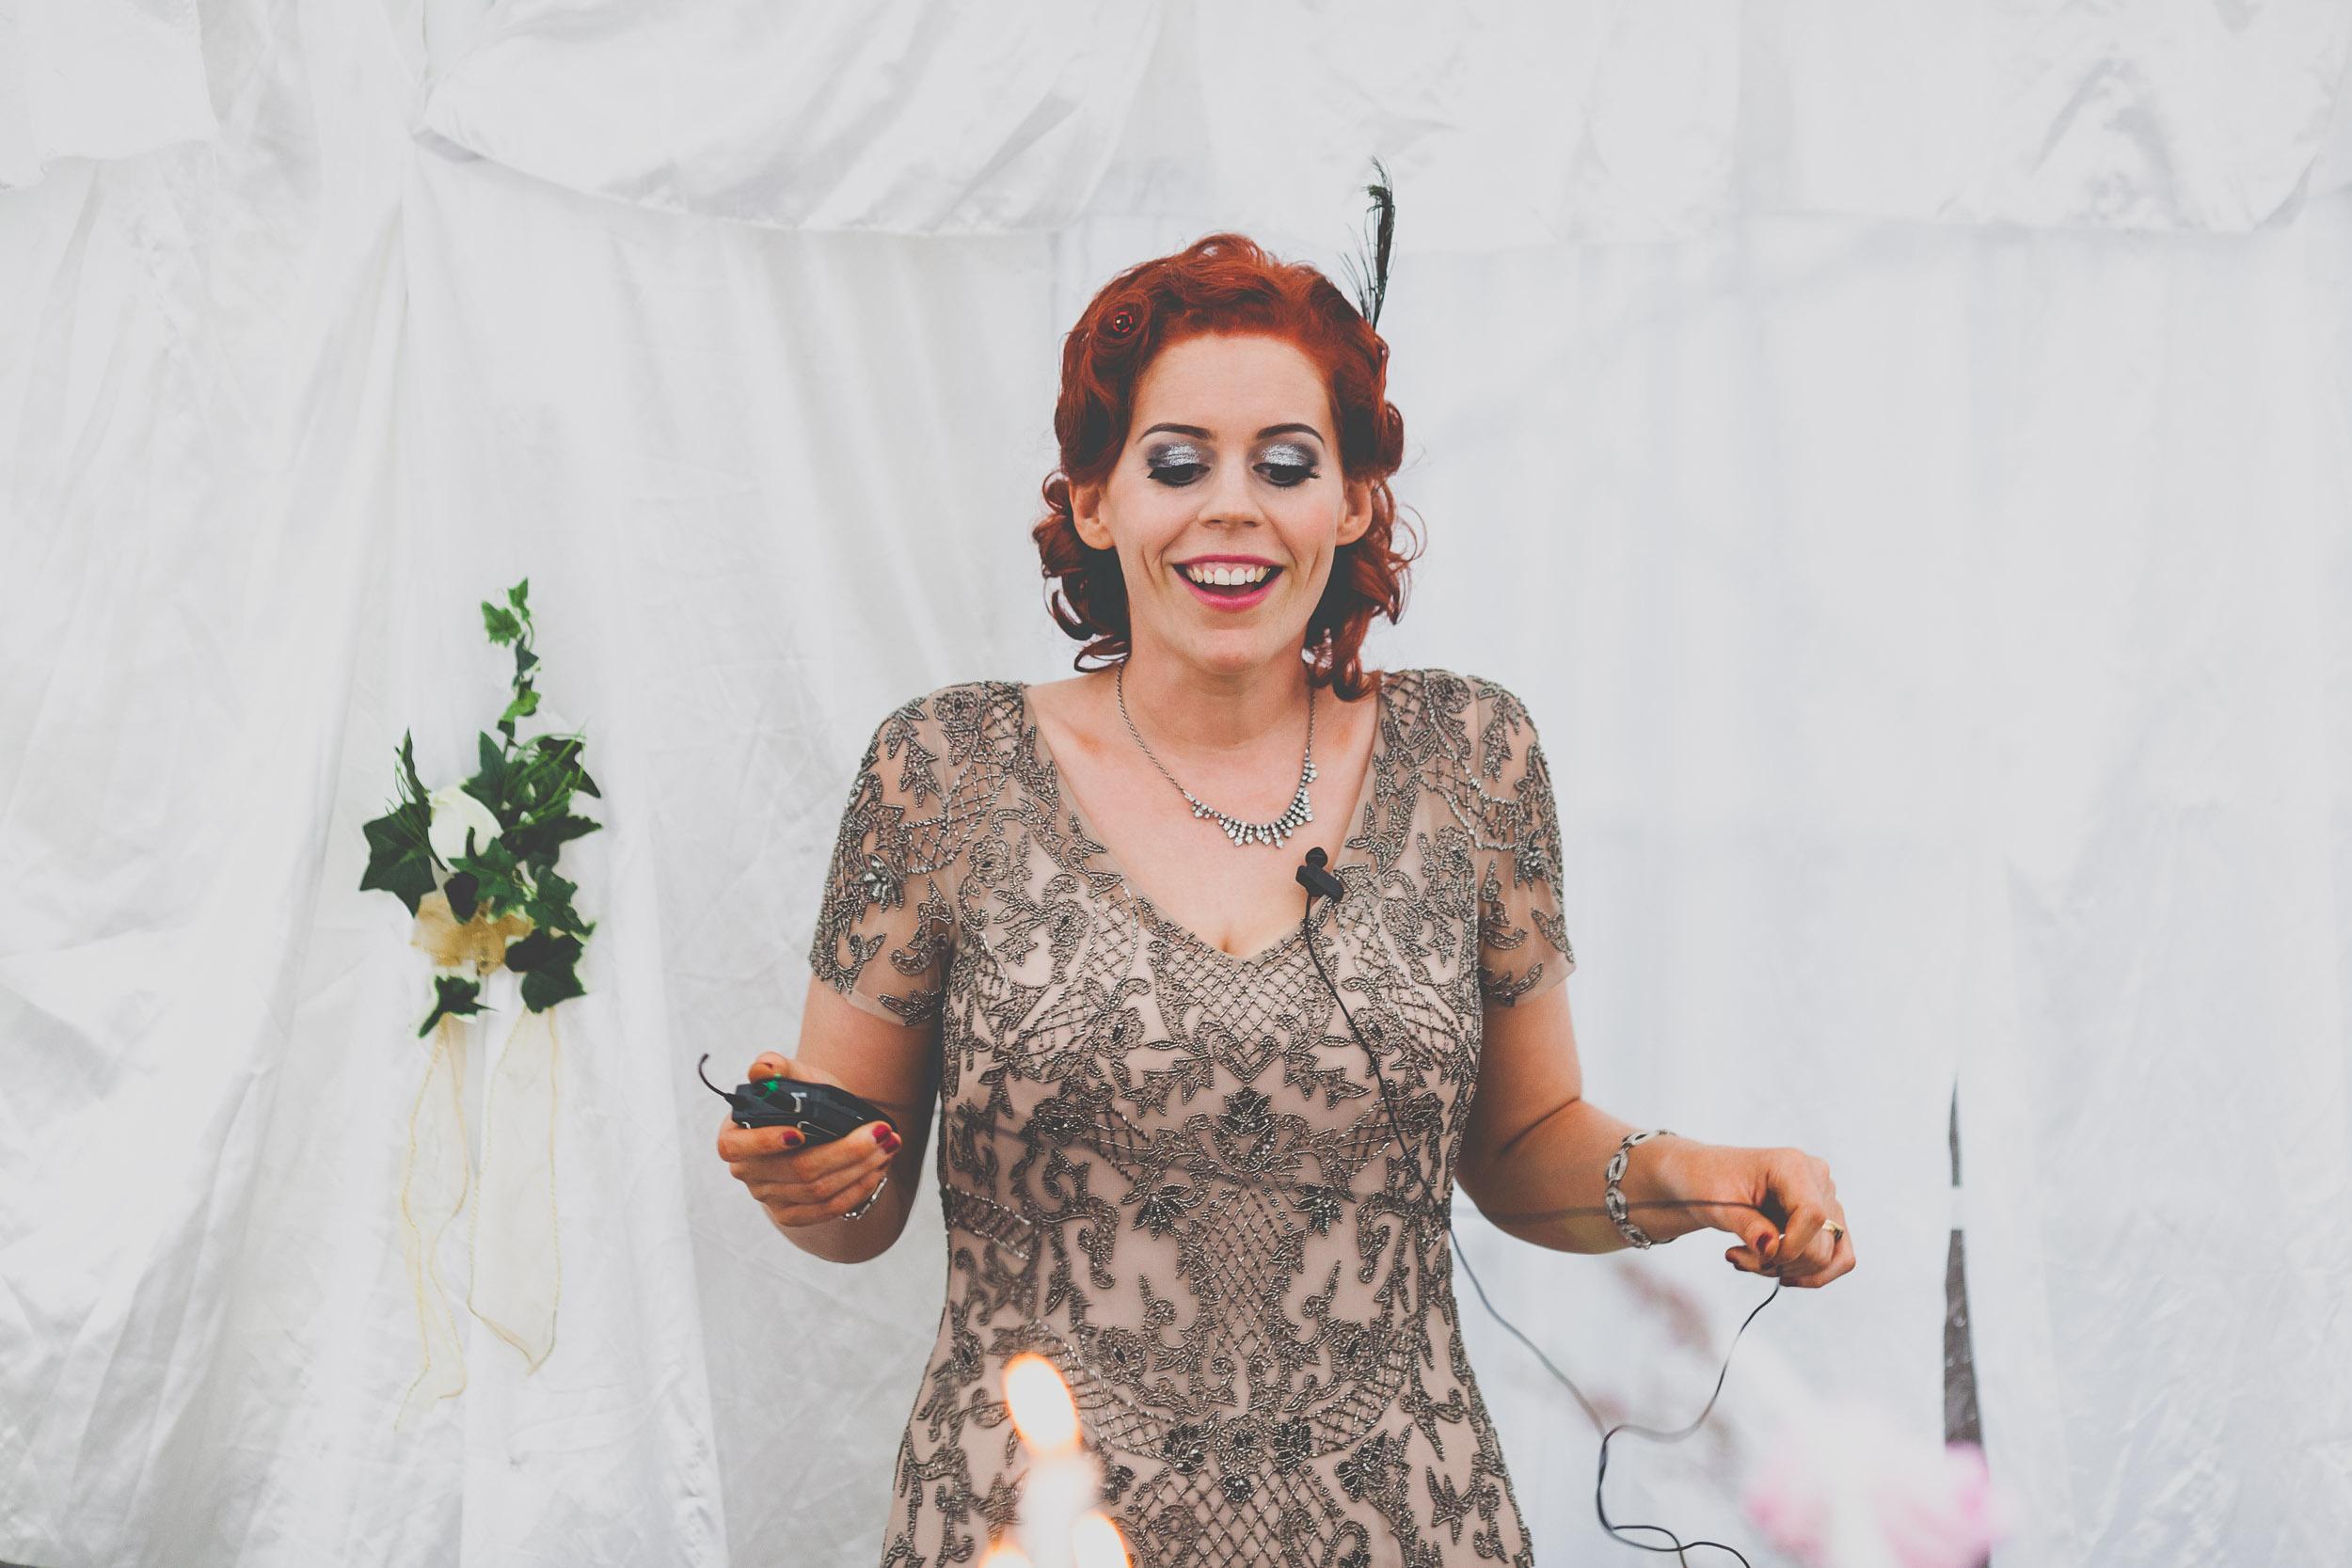 queen-elizabeths-hunting-lodge-epping-forest-wedding351.jpg